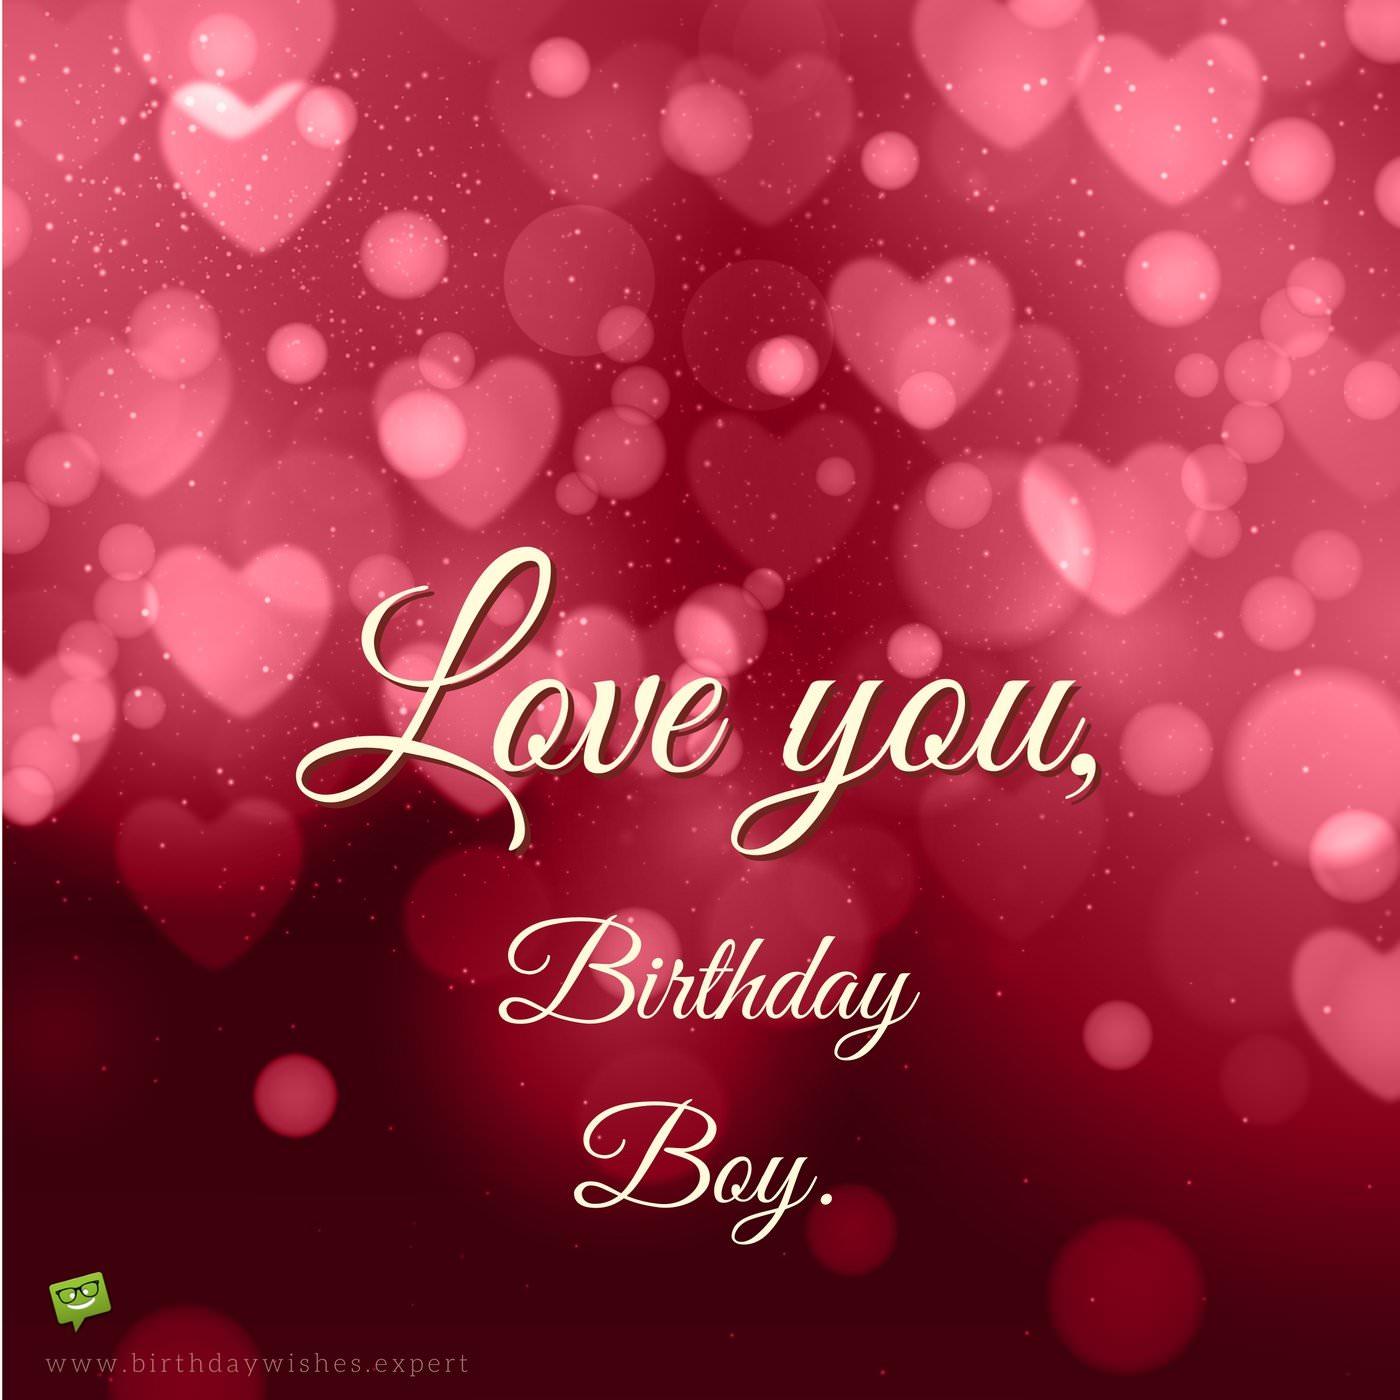 Smart Birthday Wishes for your Boyfriend – Birthday Greeting for Boyfriend